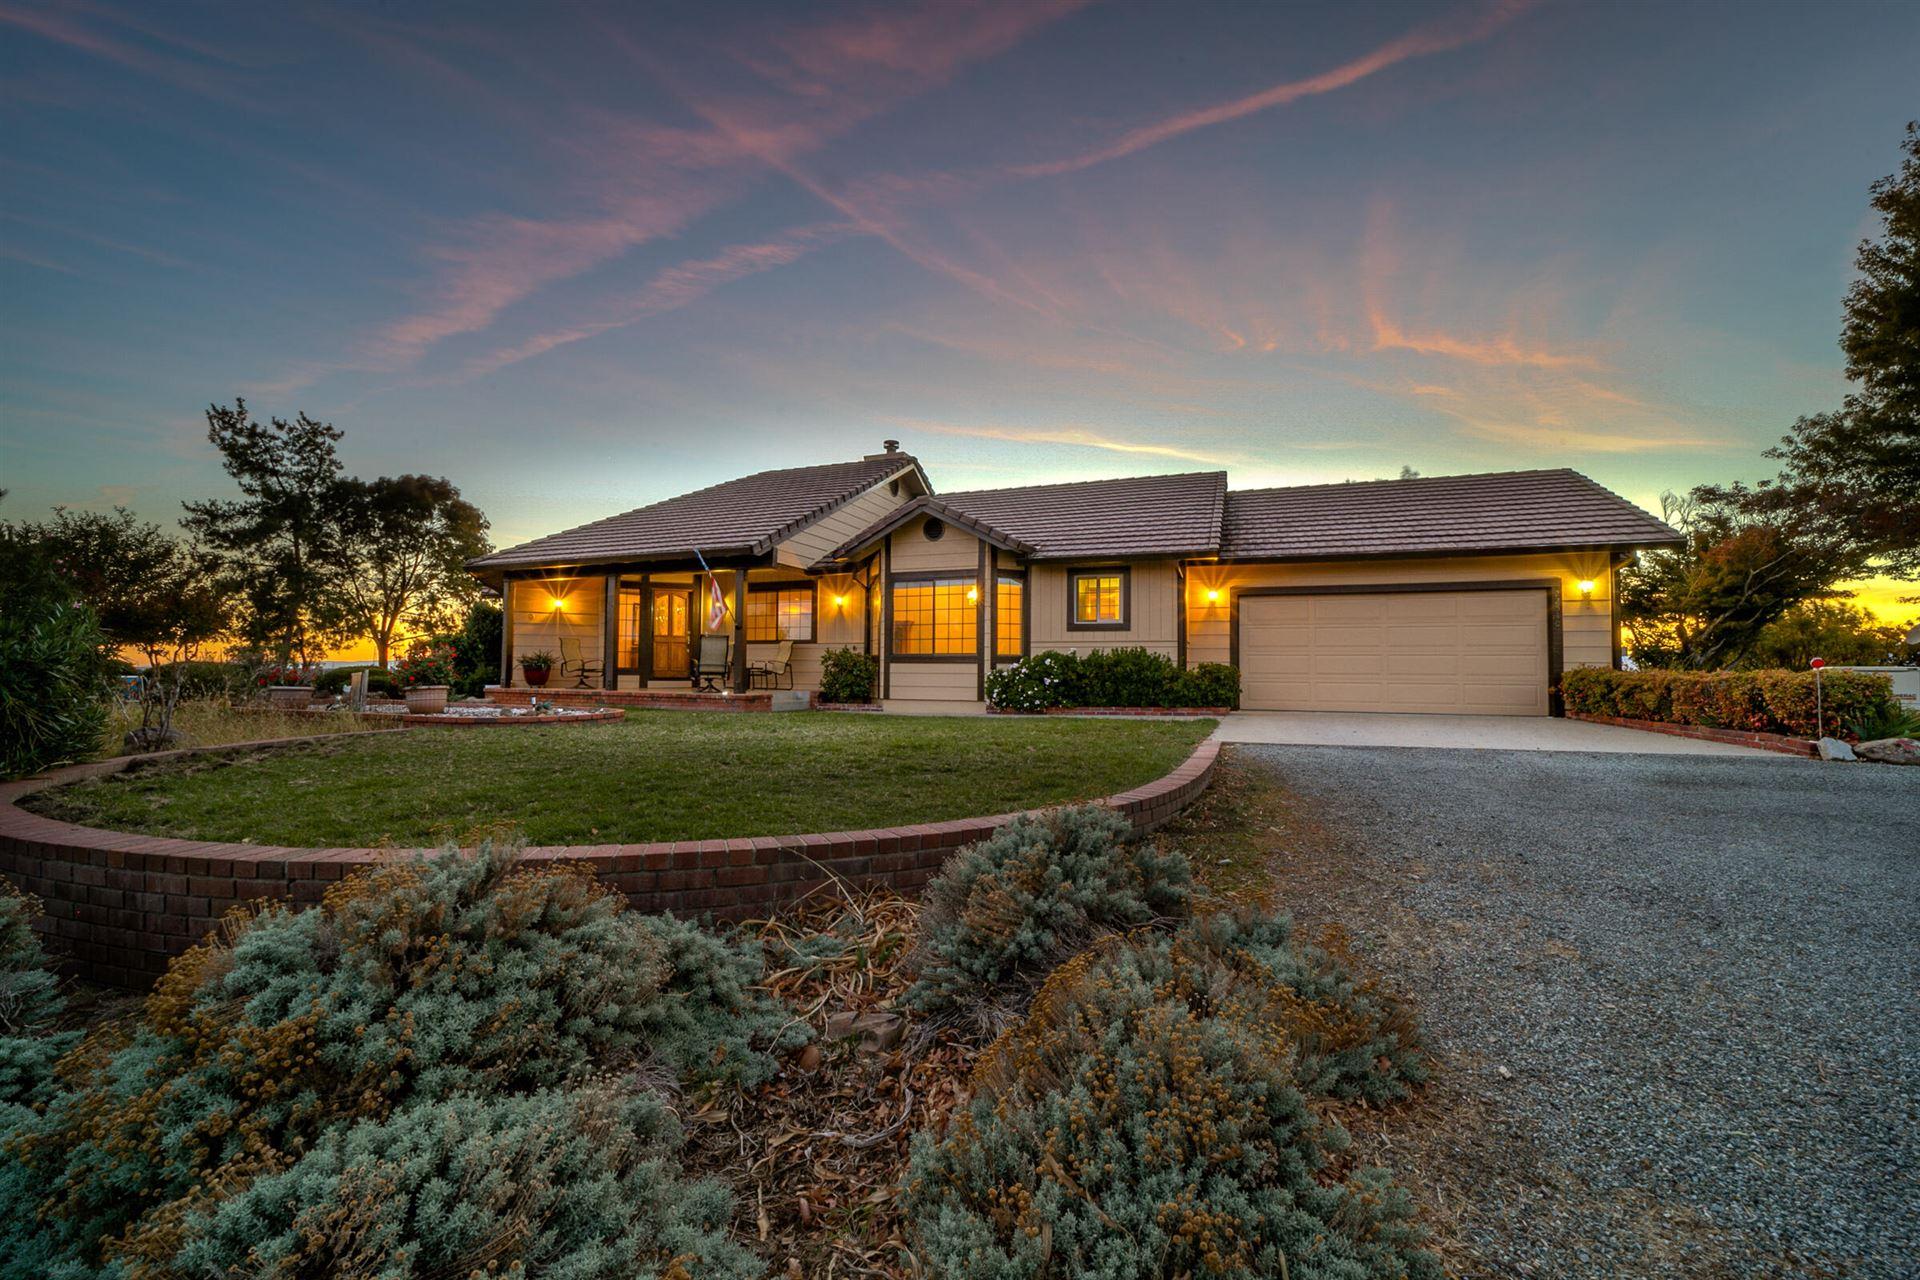 Photo of 22510 Meadowcrest Ln, Palo Cedro, CA 96073 (MLS # 21-4923)